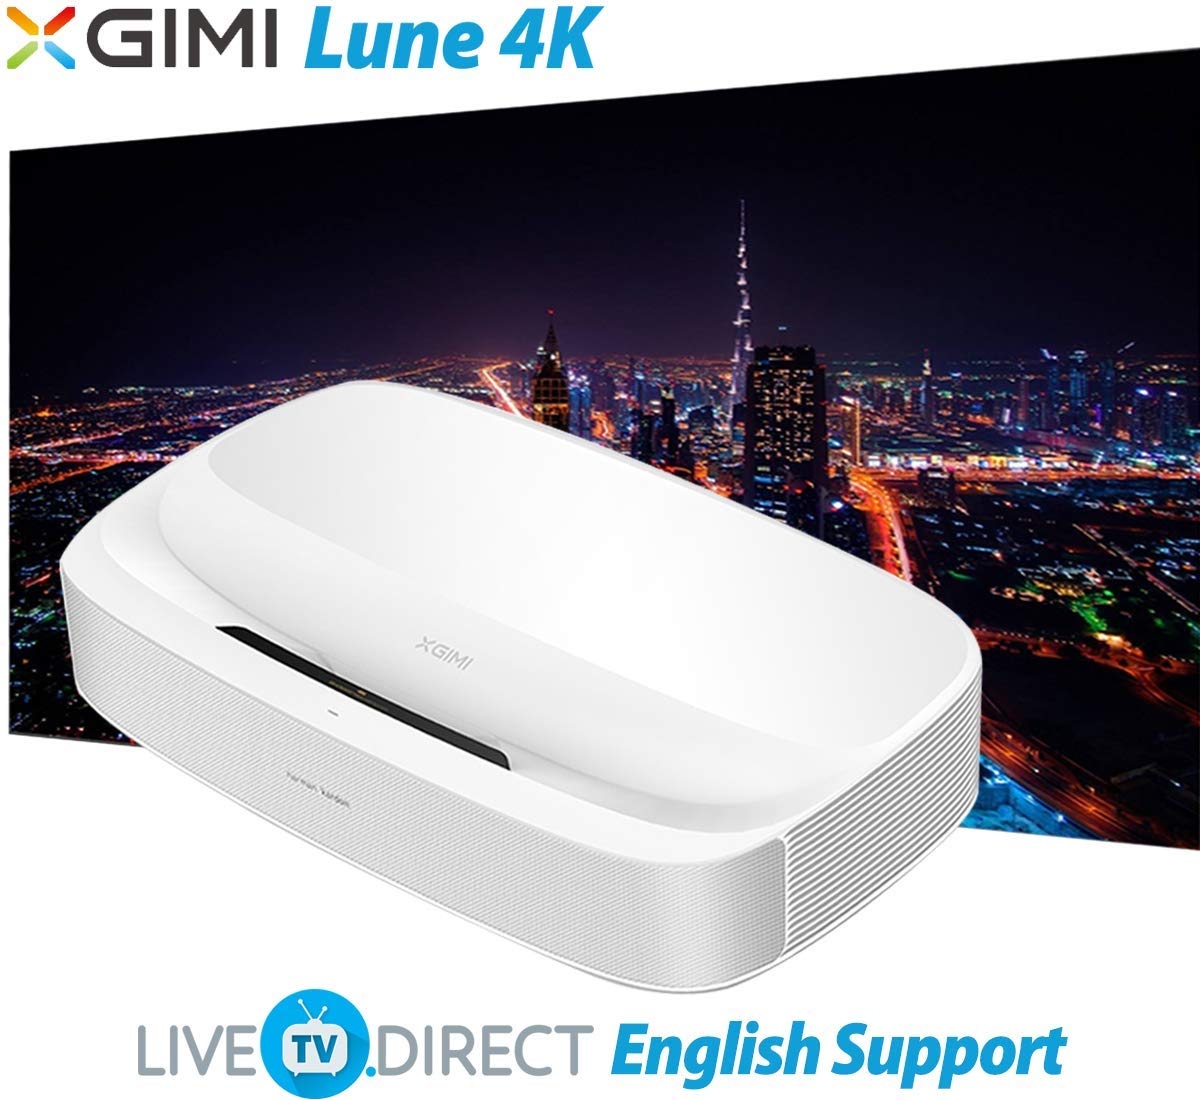 4Kプロジェクター XGIMI Lune4K 元の4K UHD スーパーショートフォーカス Android 3D スマートTV ホームシアタープロジェクター 内蔵60W Harman/Kardon高忠実度HiFi音声 B07MYMK8F3